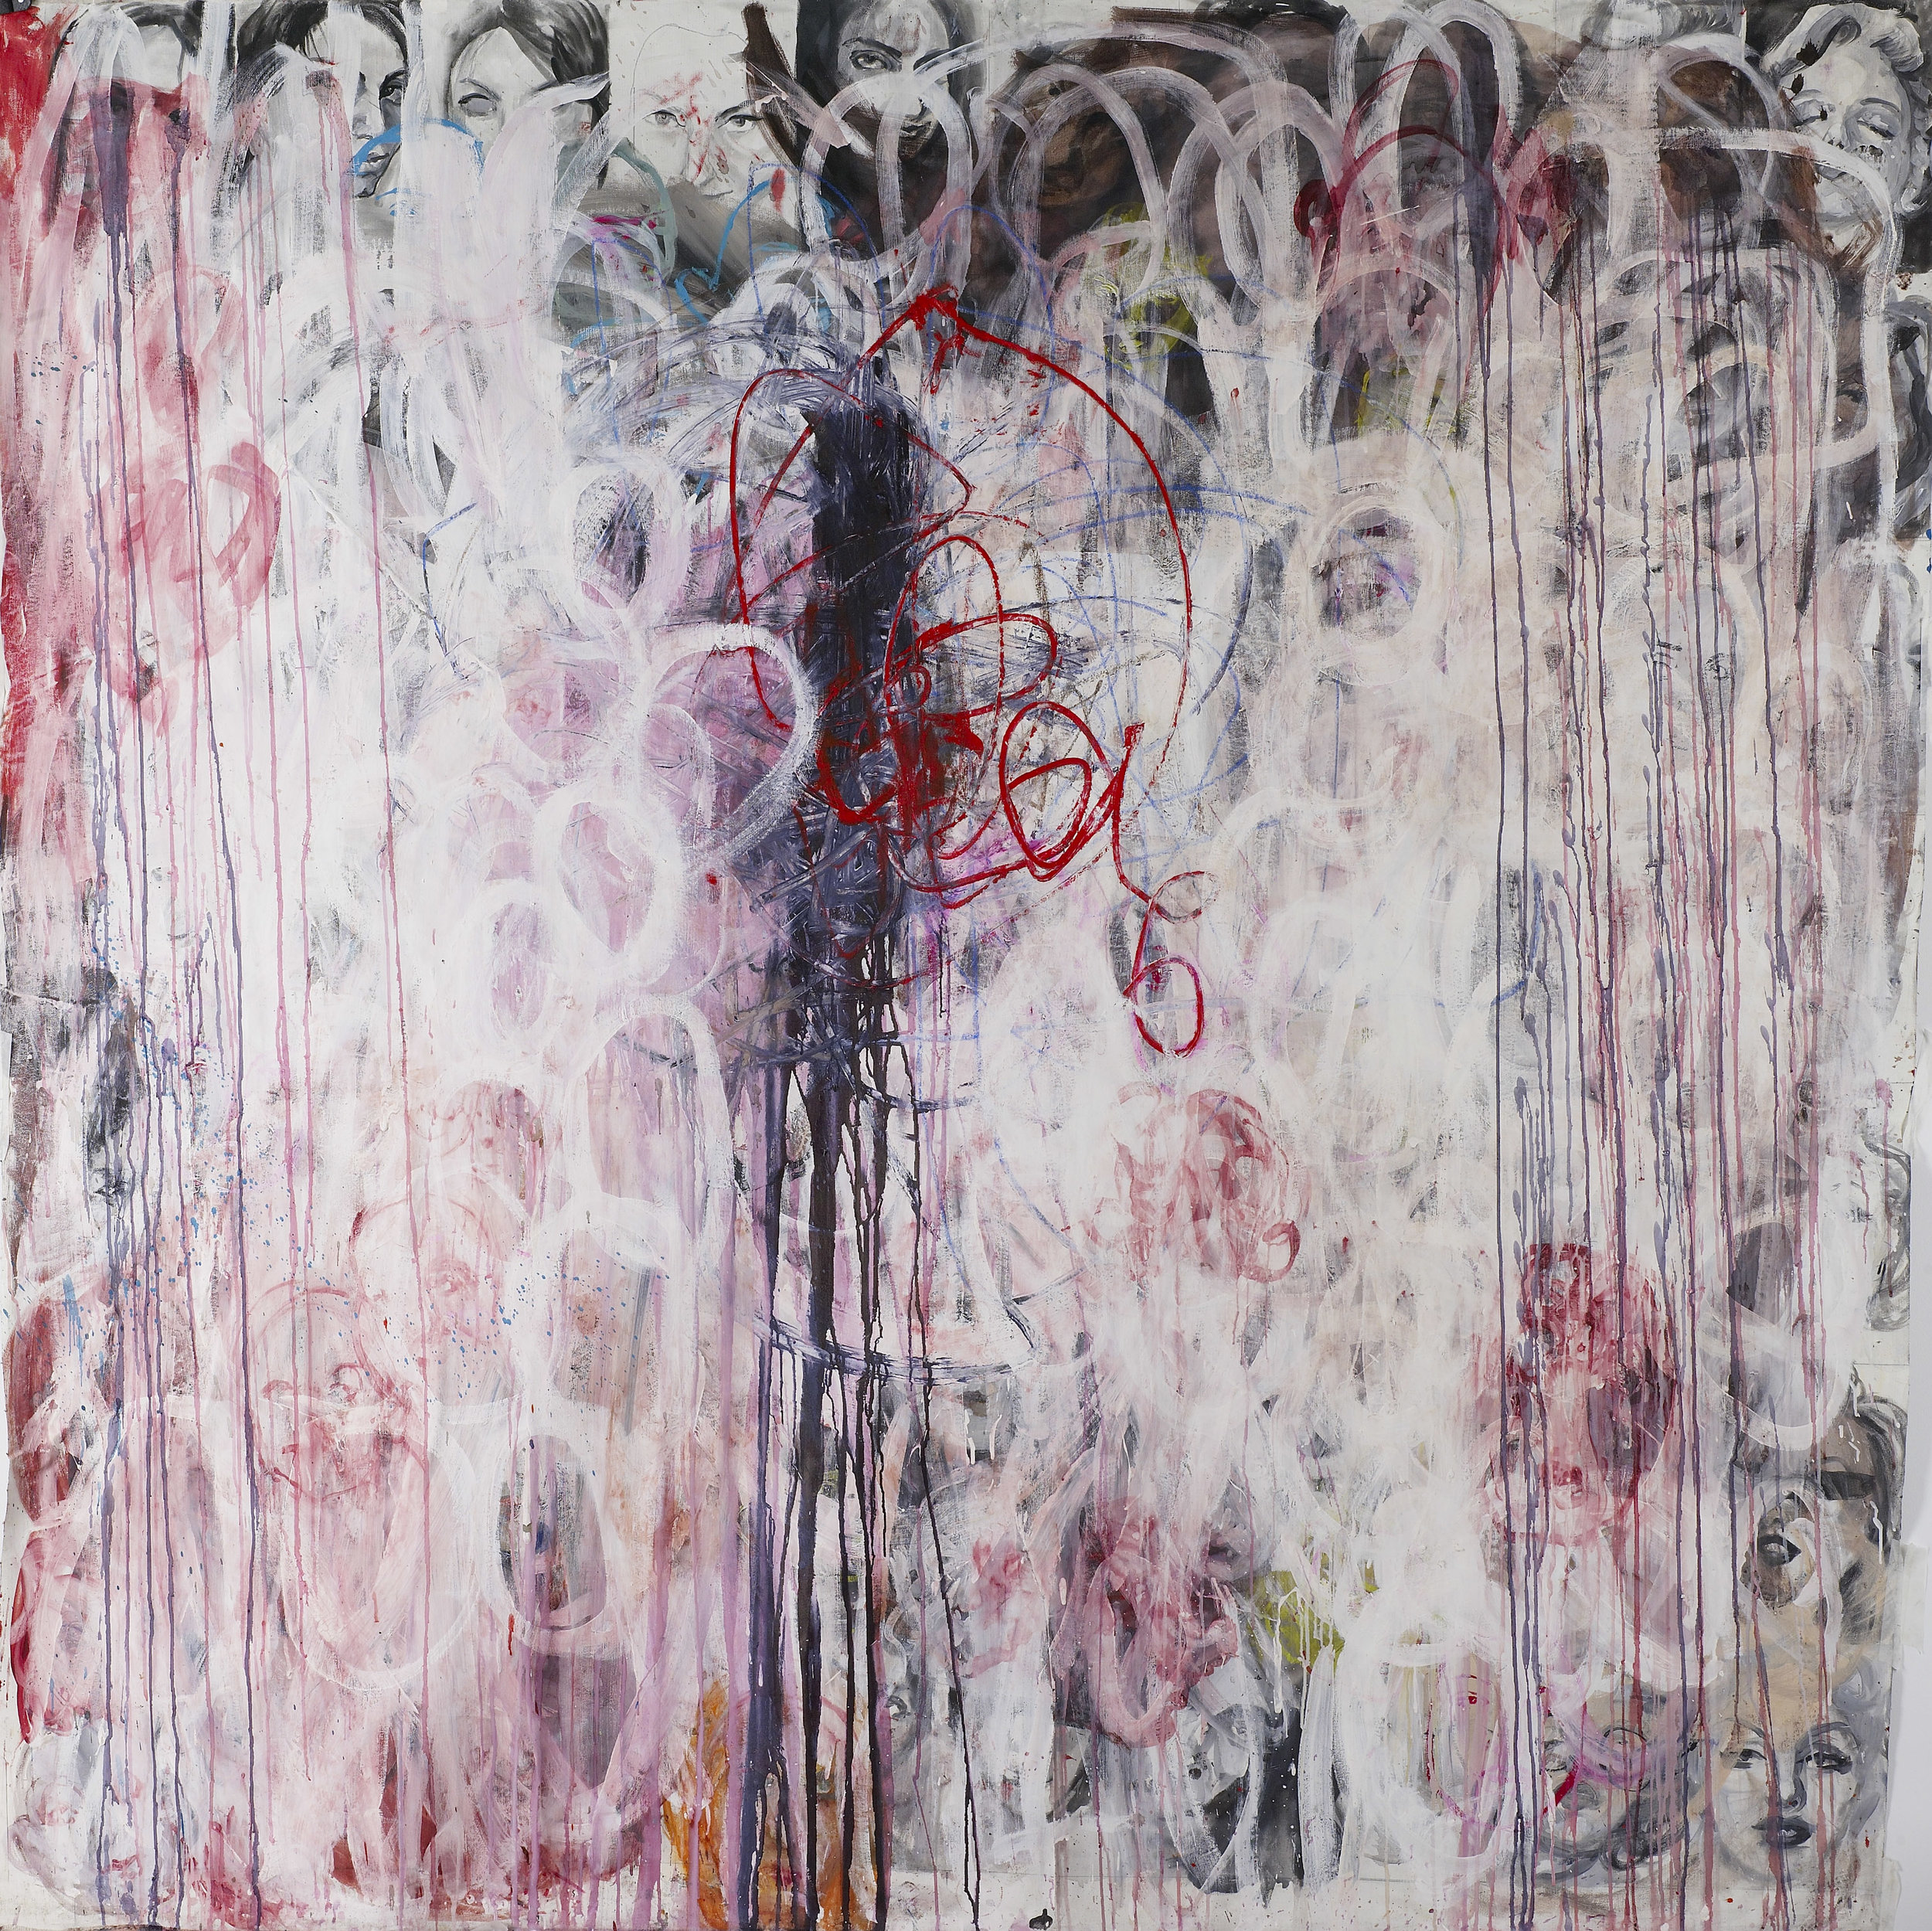 Heads No2, oil, gouache on canvas, 190x190cm, 2010-2019